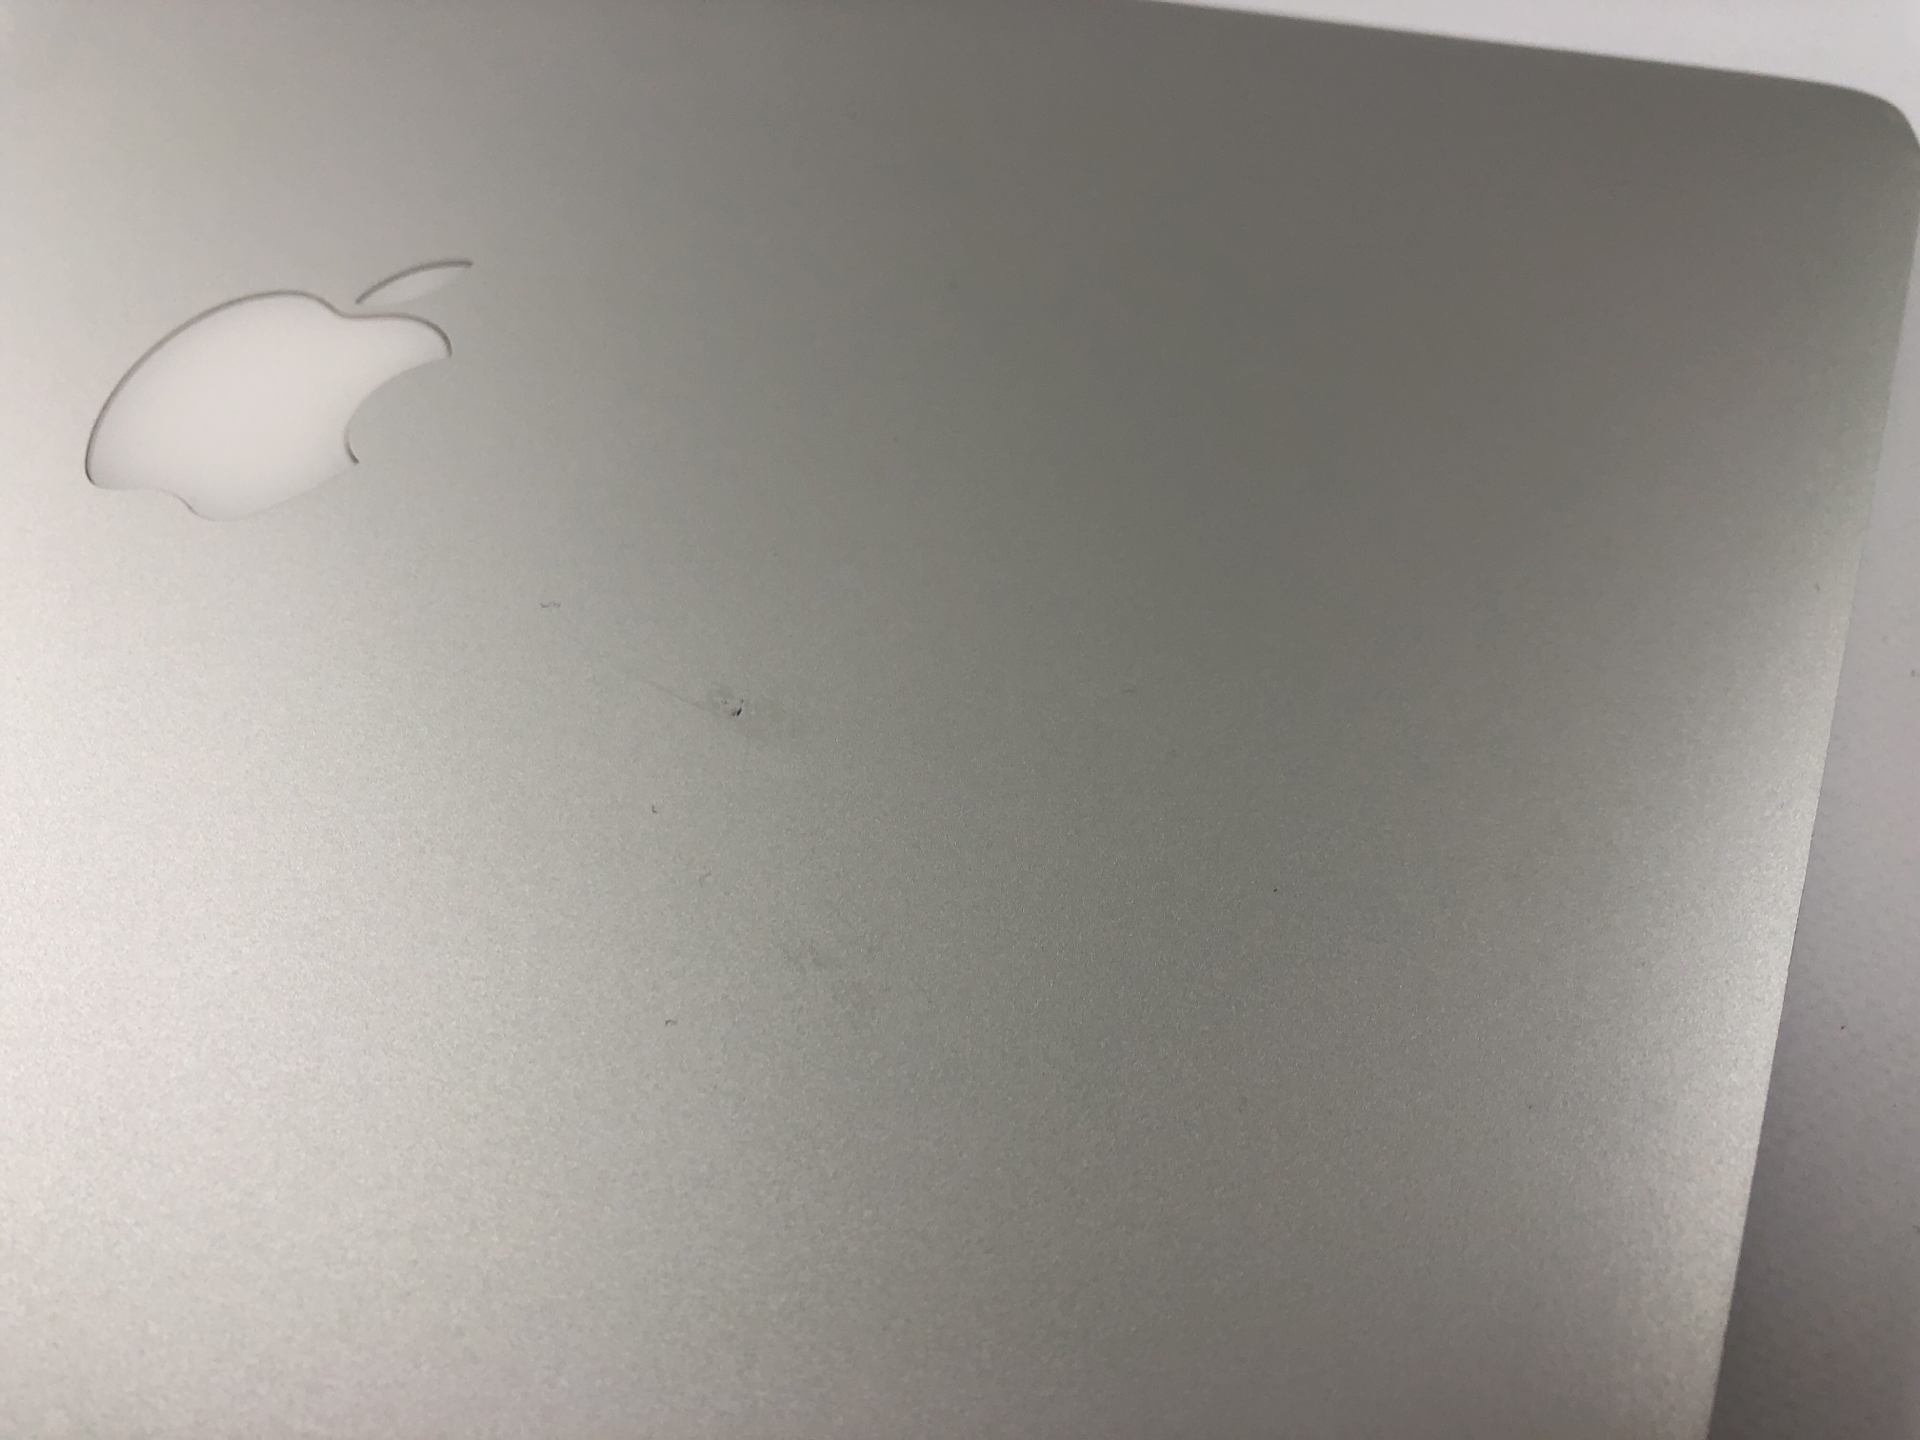 "MacBook Air 13"" Early 2015 (Intel Core i5 1.6 GHz 8 GB RAM 128 GB SSD), Intel Core i5 1.6 GHz, 8 GB RAM, 128 GB SSD, bild 4"